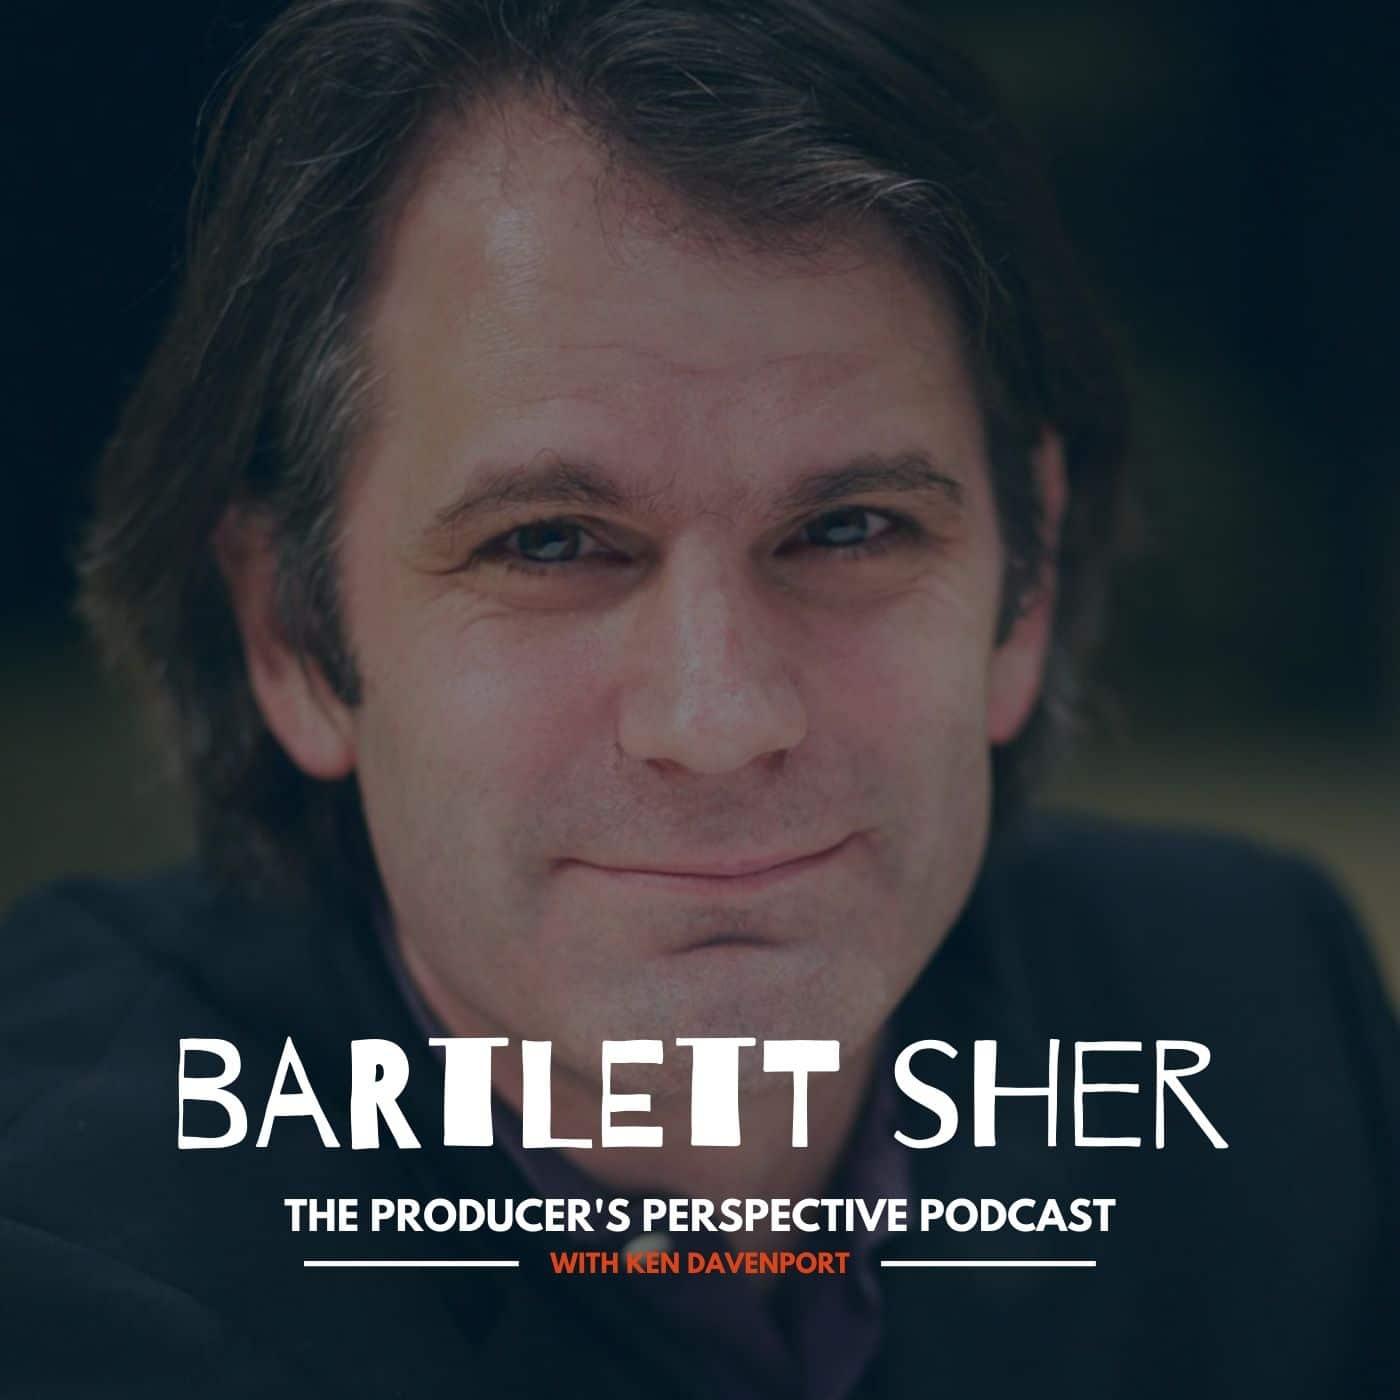 Ken Davenport's The Producer's Perspective Podcast Episode 79 - Bartlett Sher